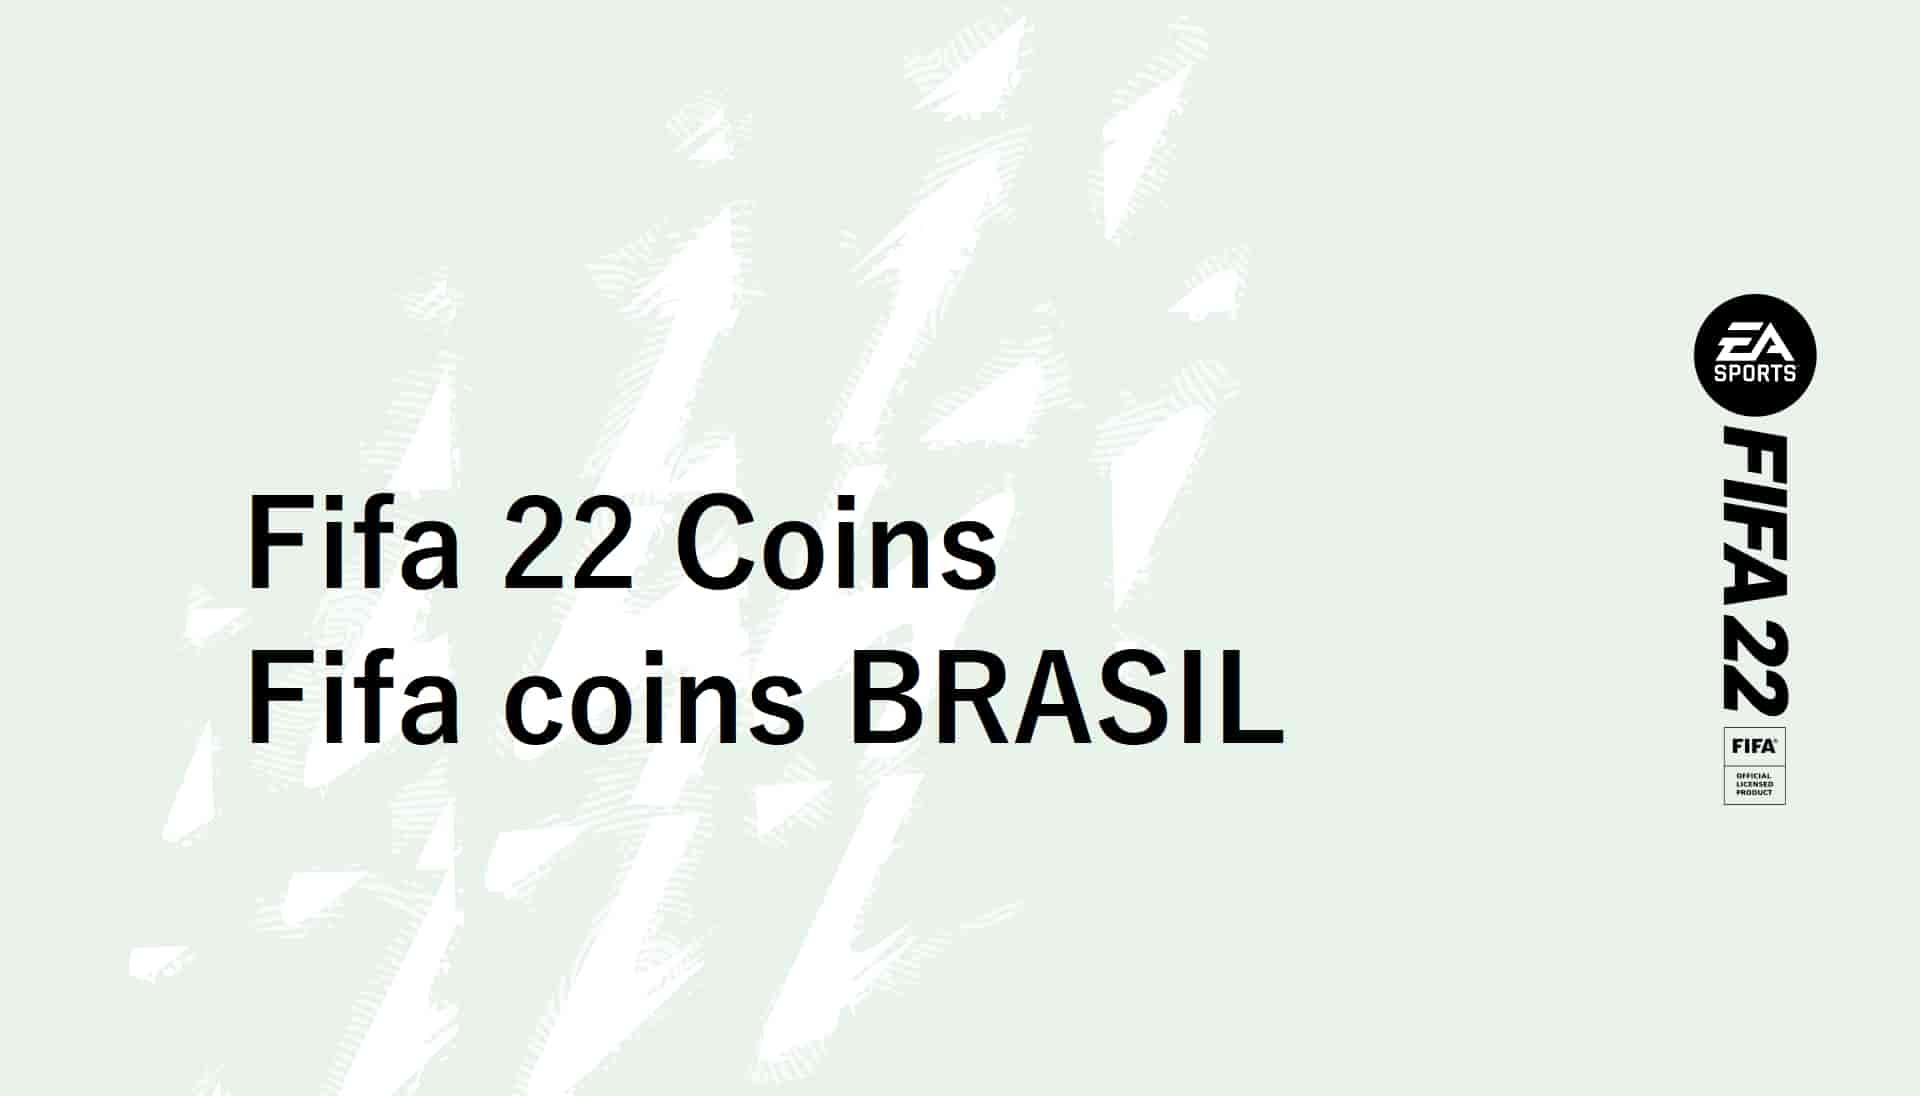 Fifa 22 coins - data de lançamento